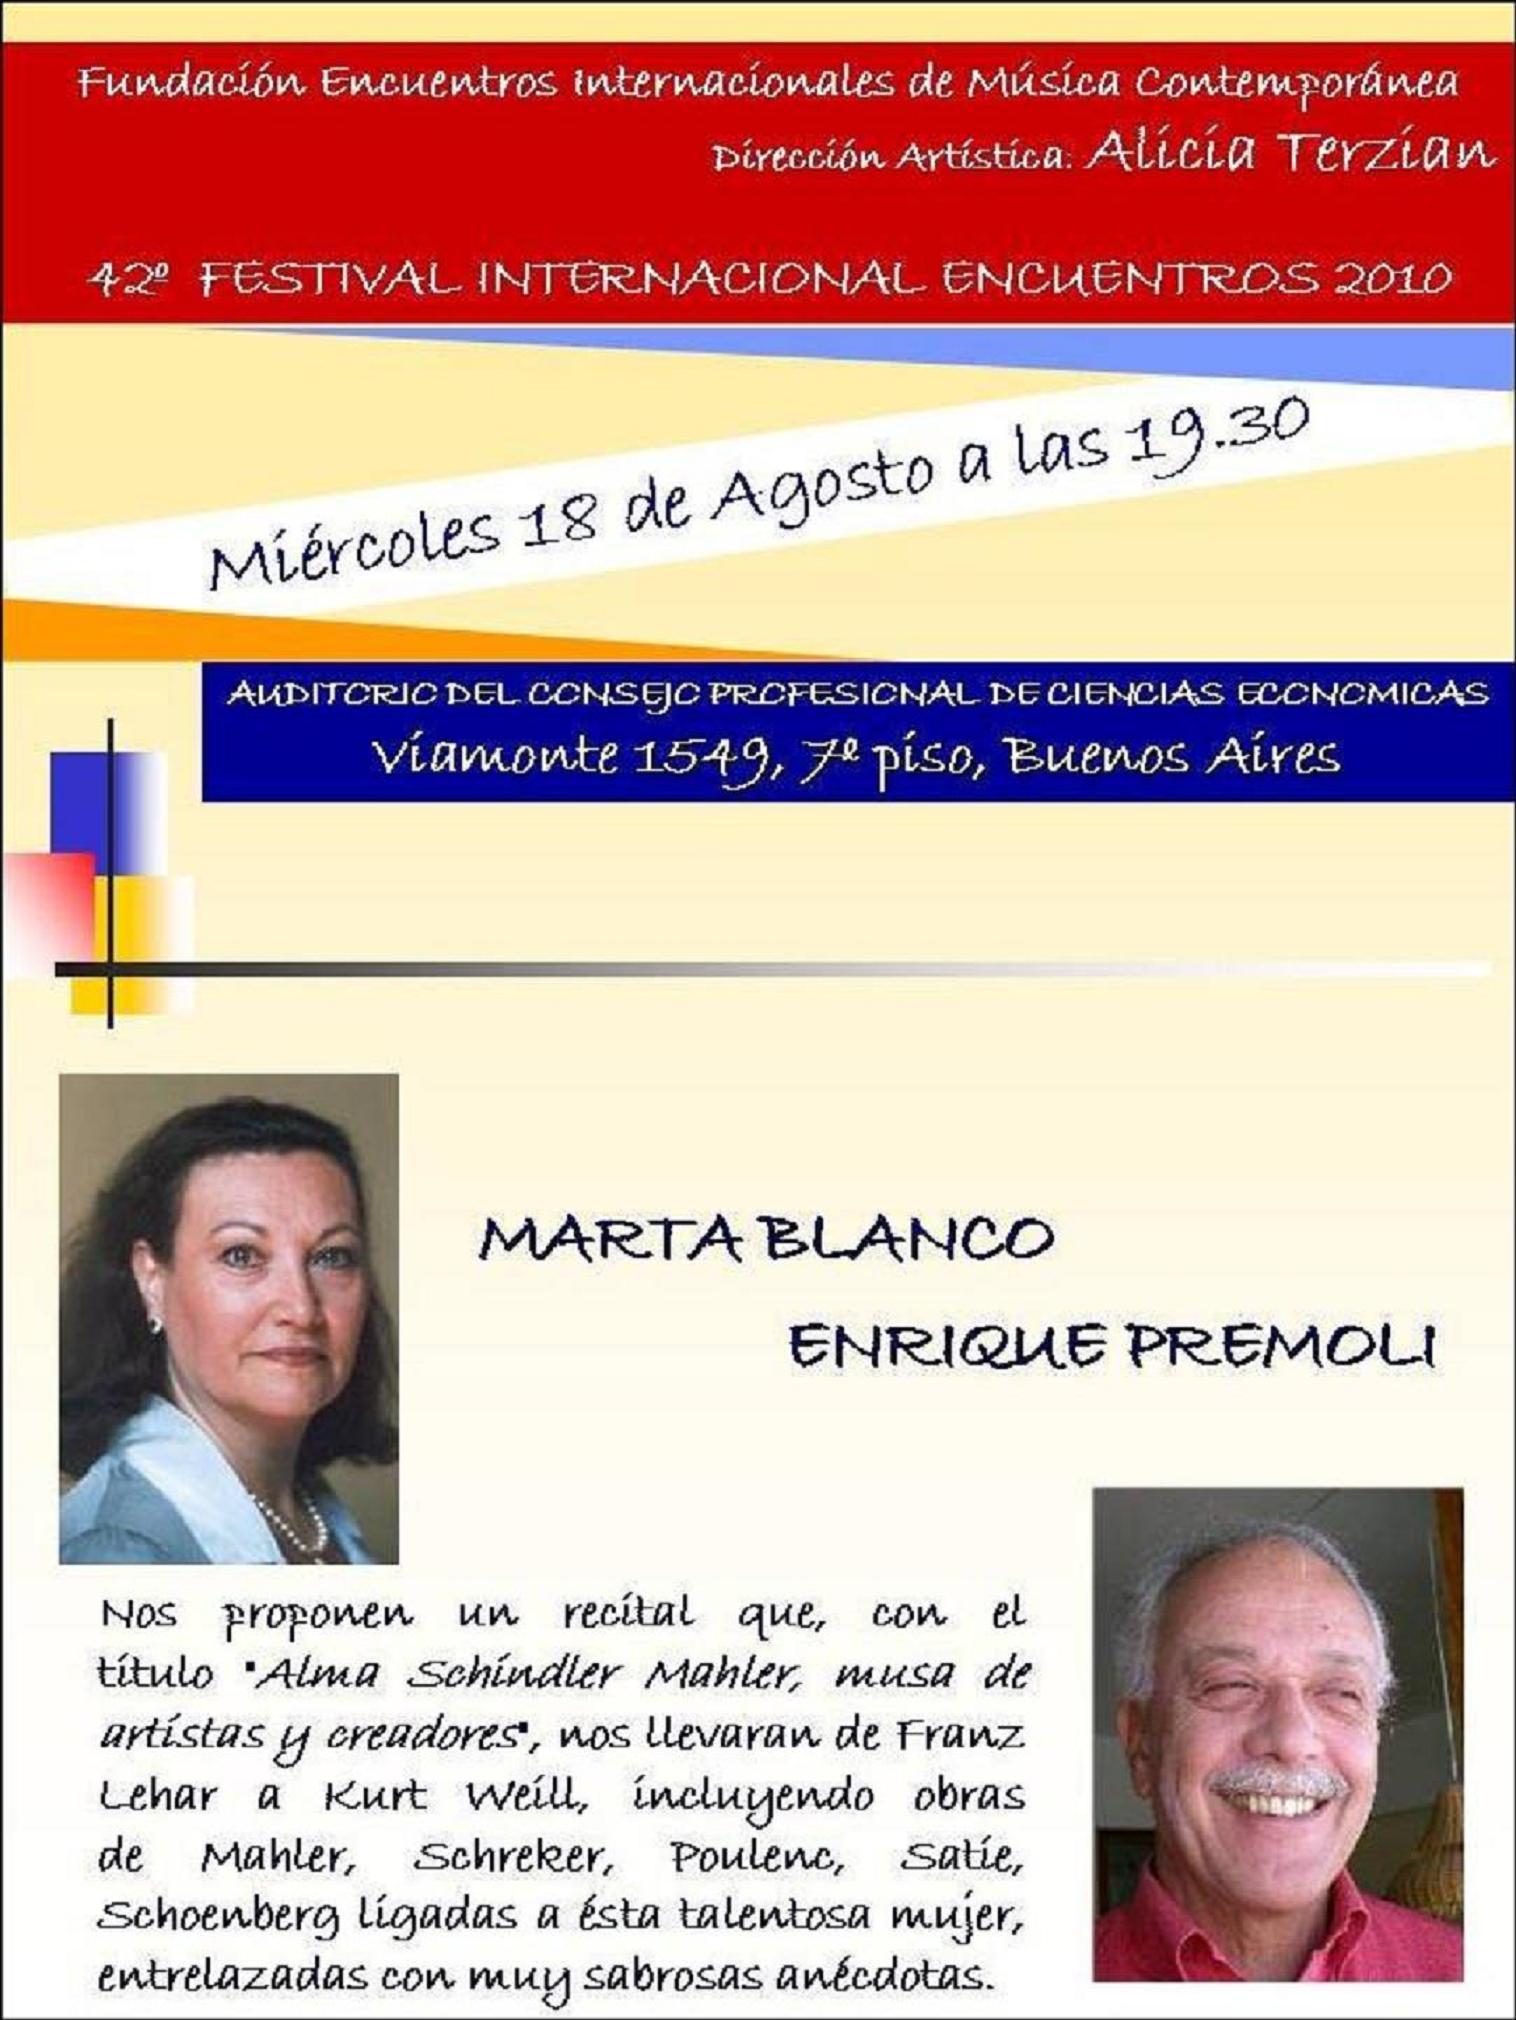 20100816172642-festival-encuentros1.jpg